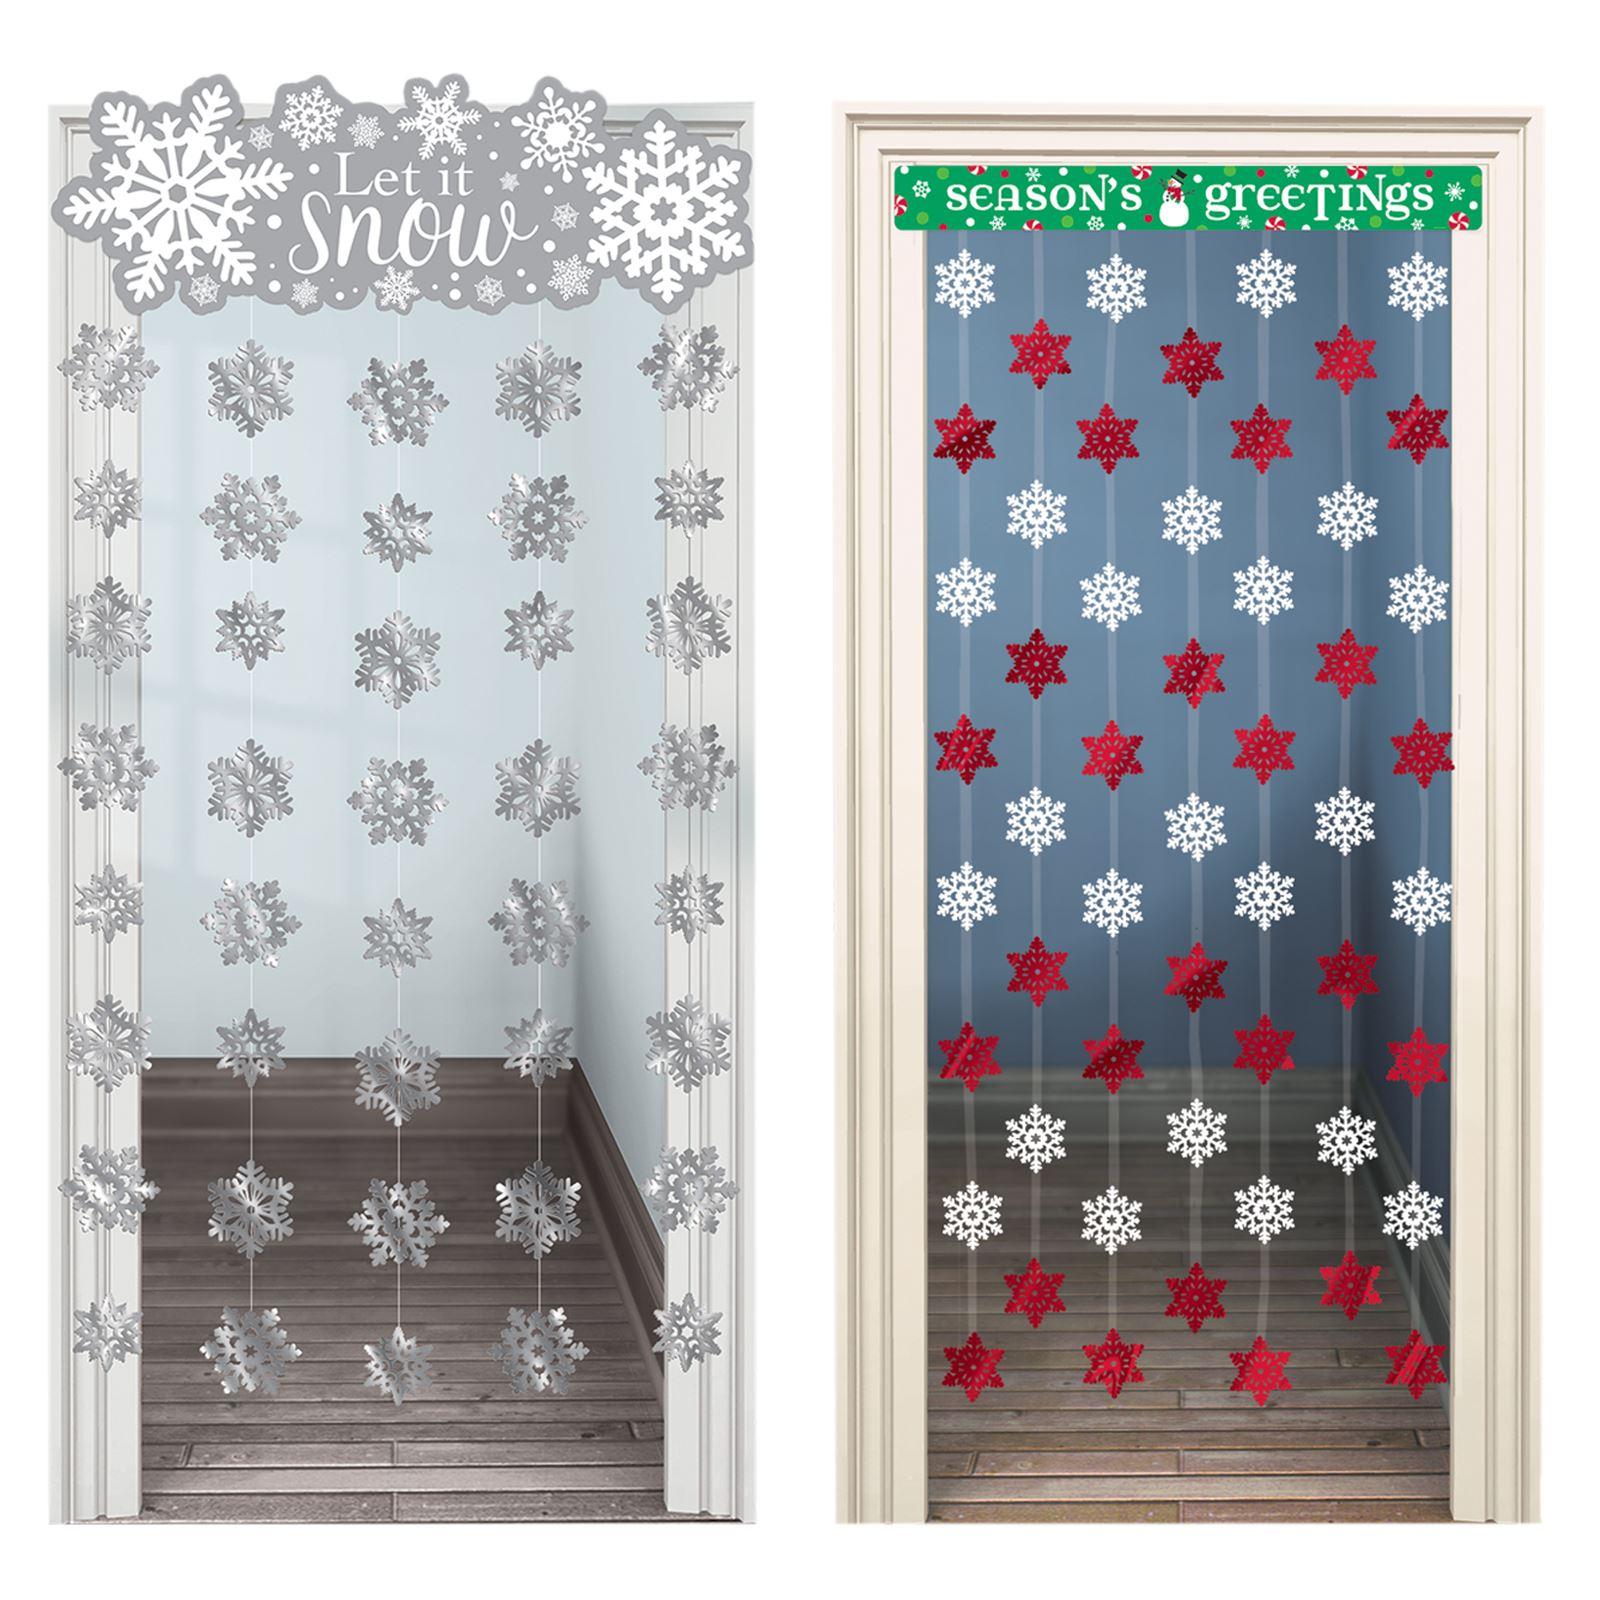 Snowflake Christmas Festive Door Curtain Hanging Wonderland Party Decoration Ebay